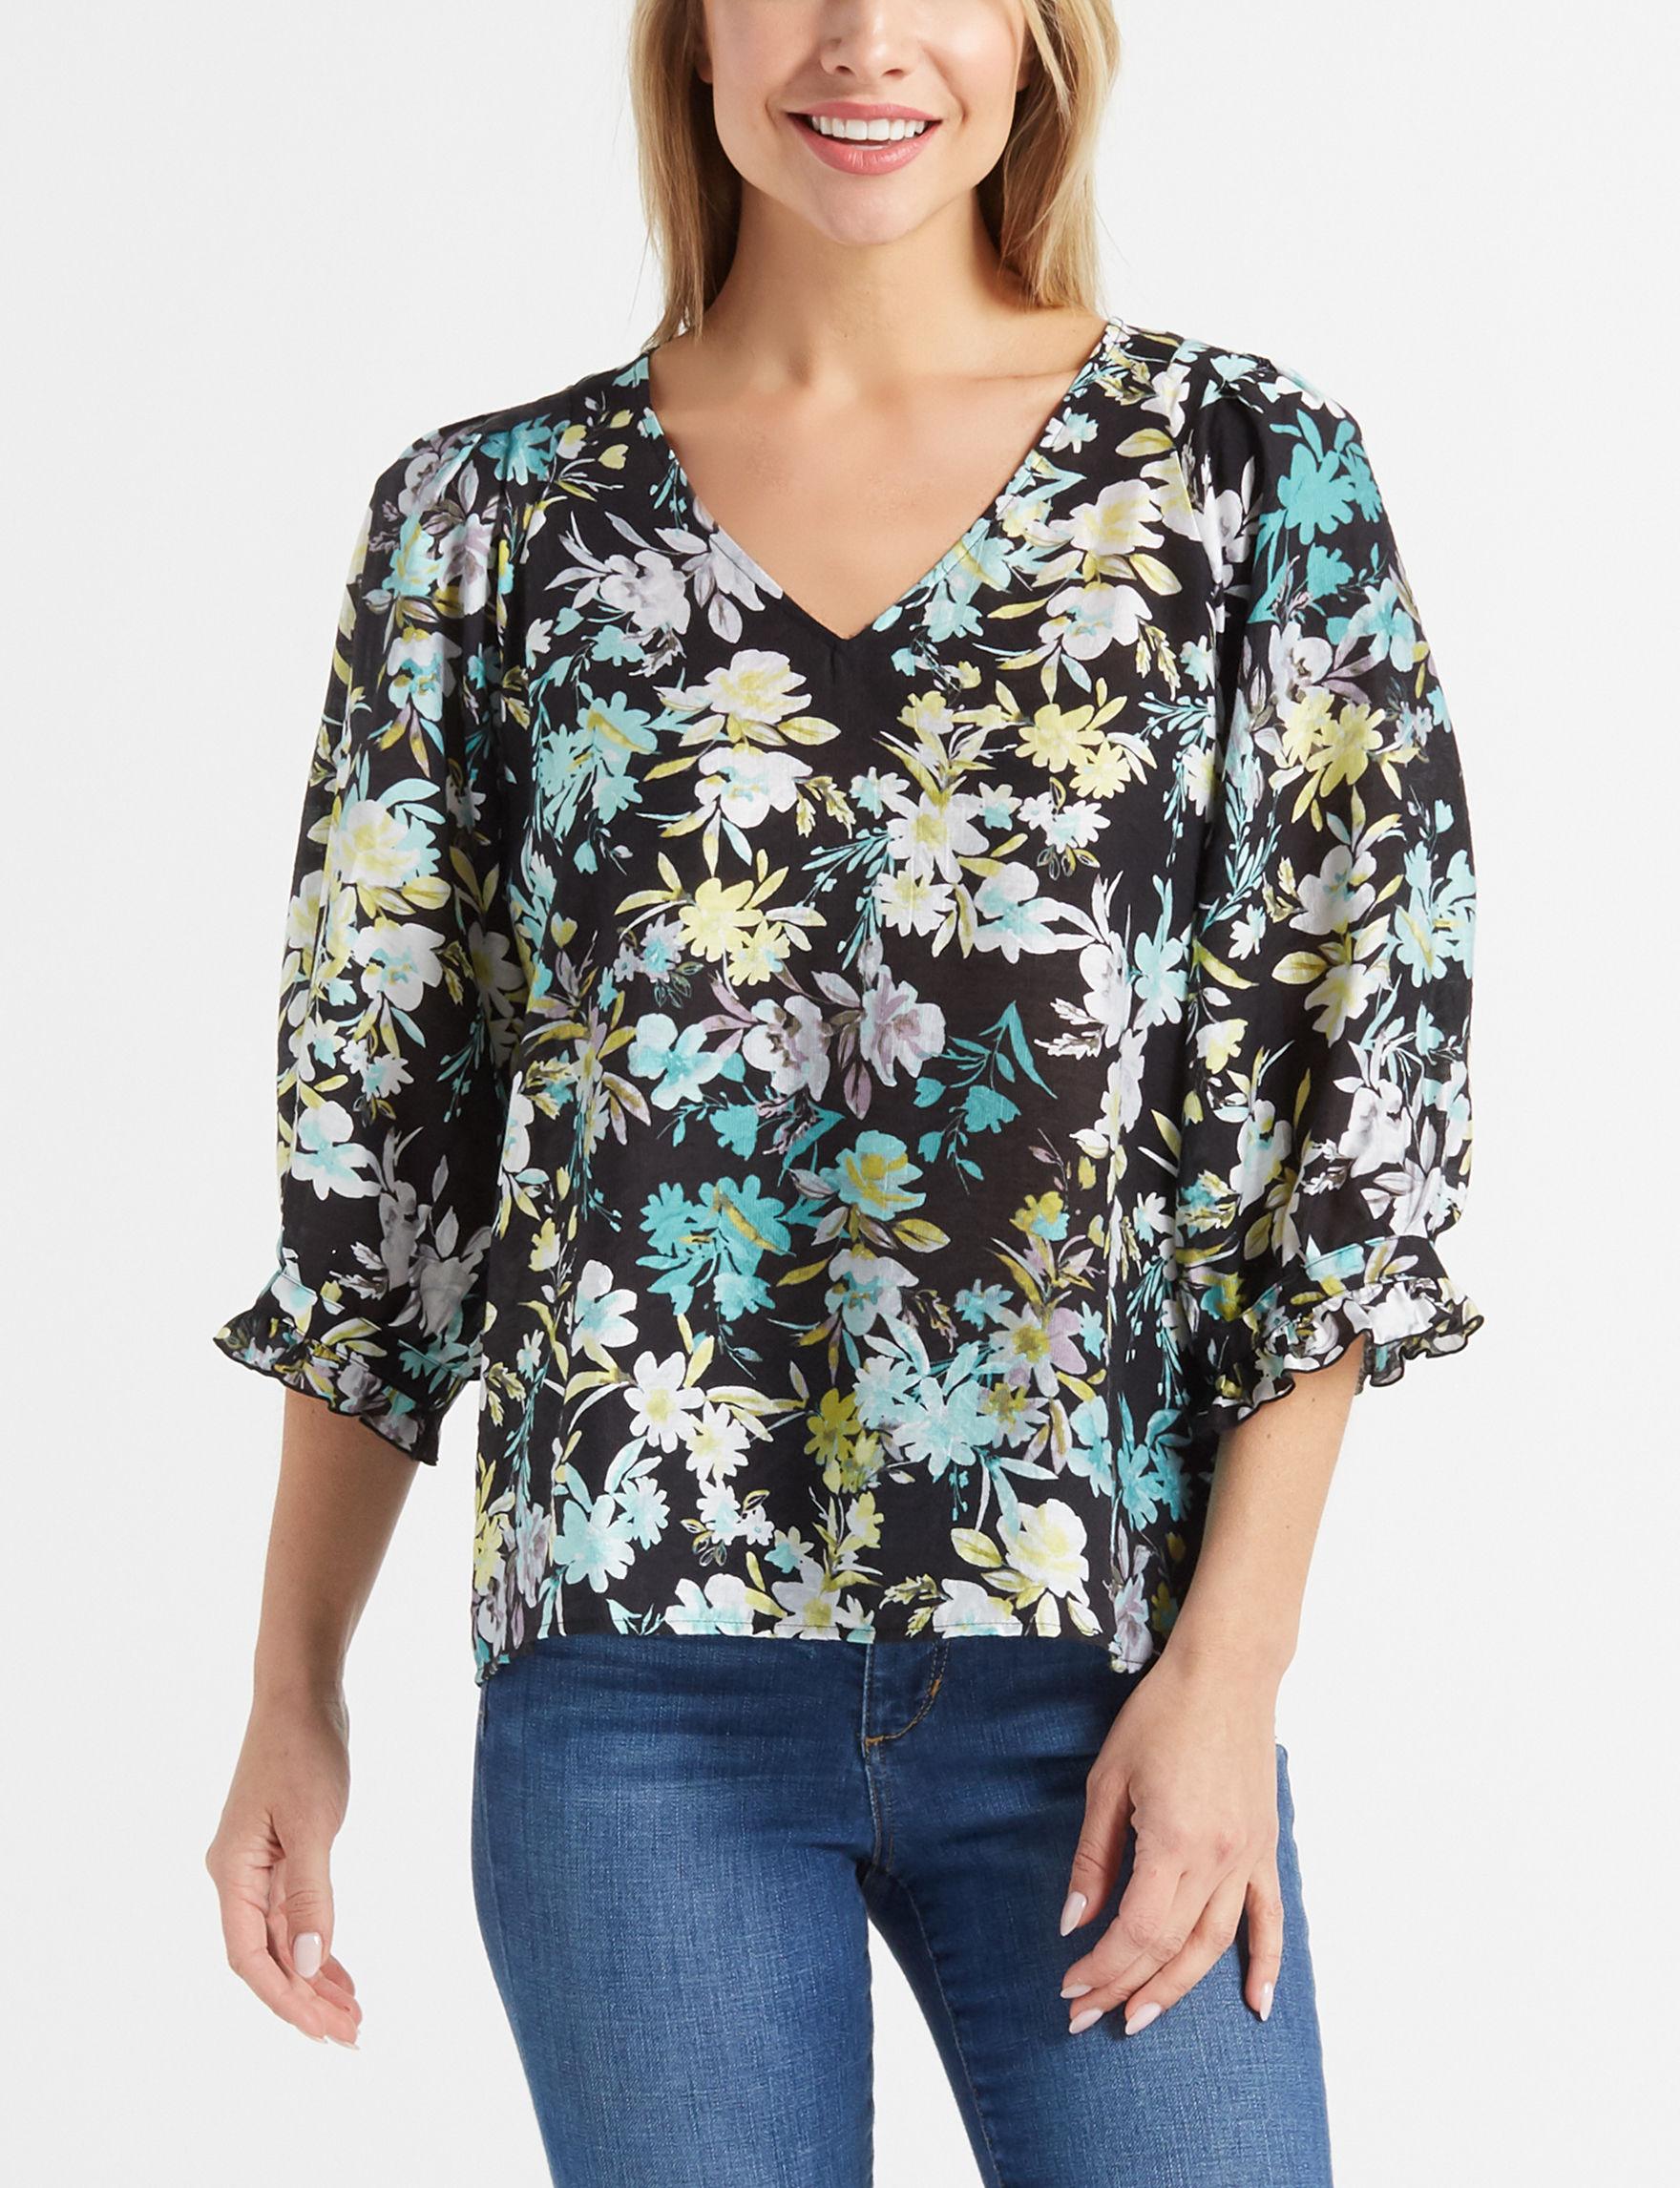 Zac & Rachel Black Floral Shirts & Blouses